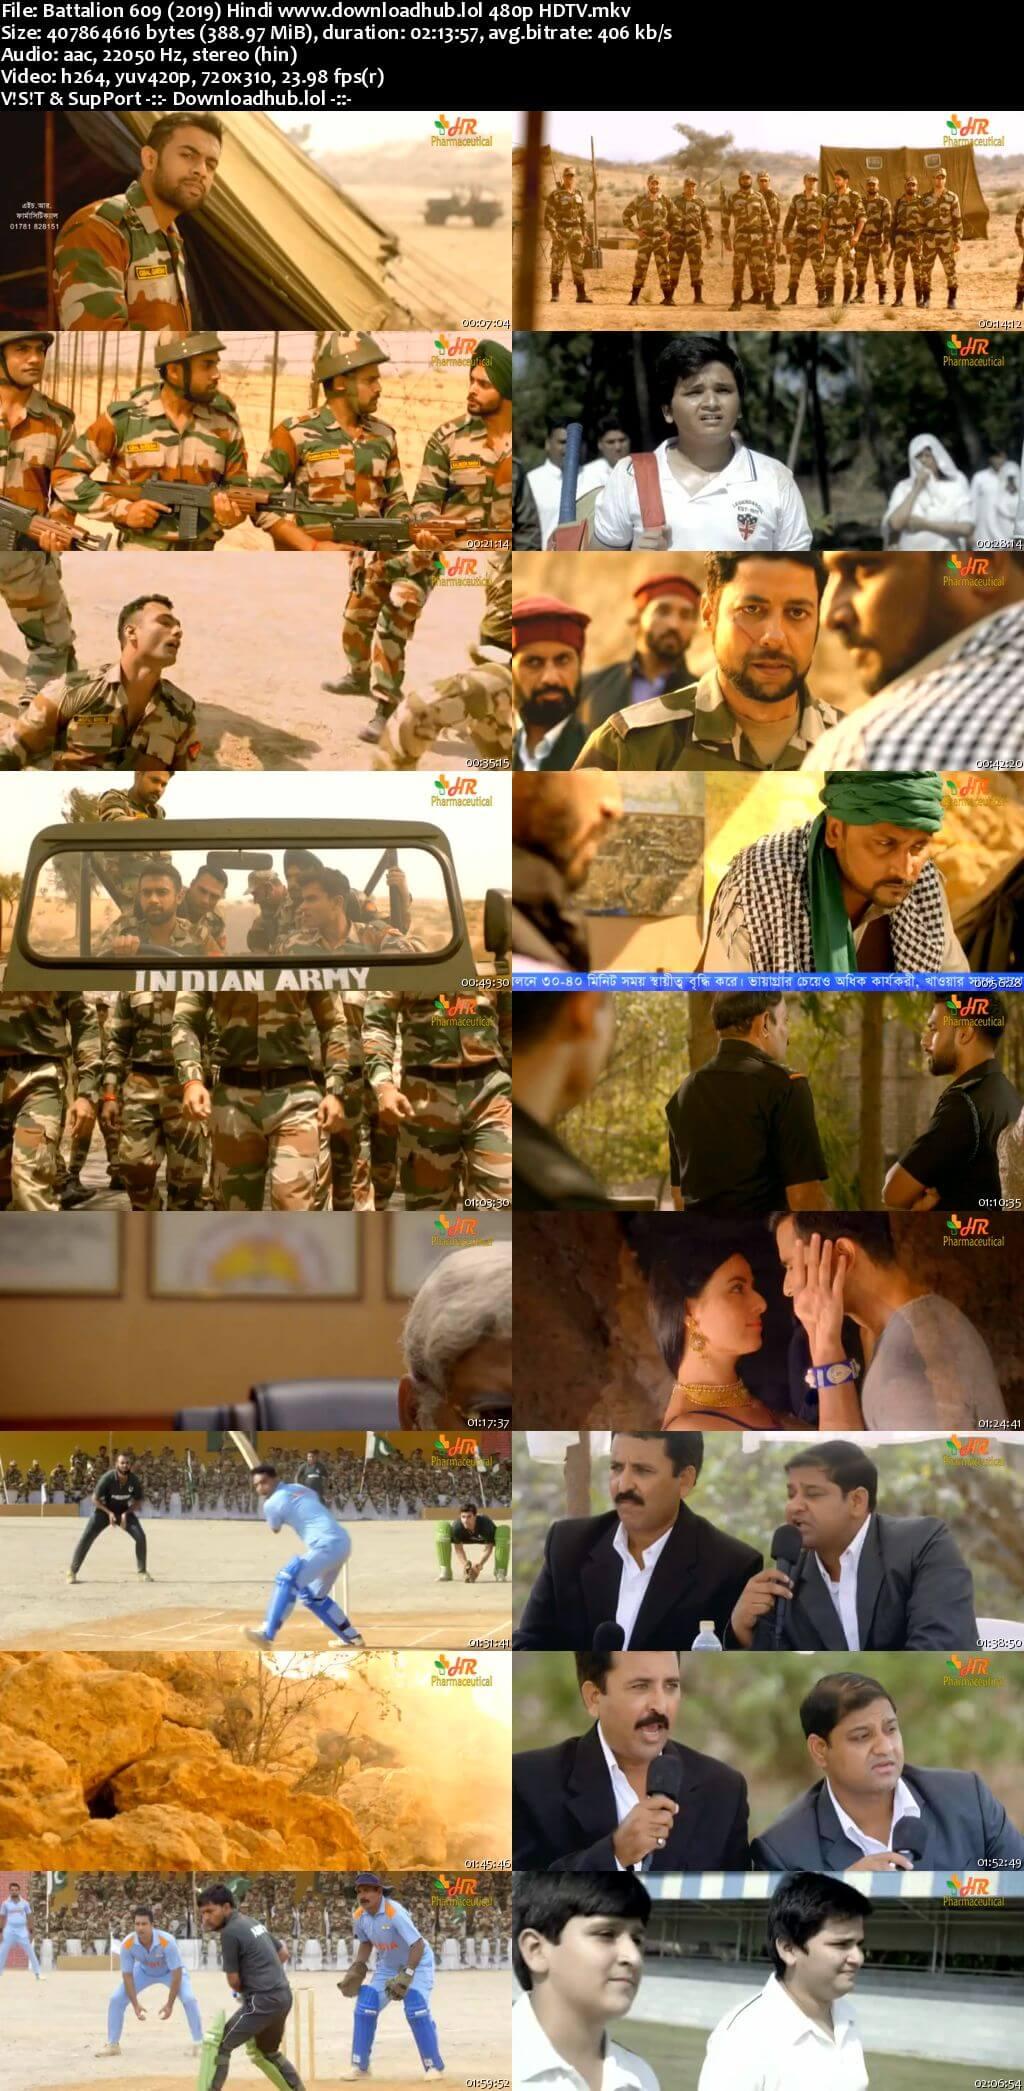 Battalion 609 2019 Hindi 350MB HDTV 480p